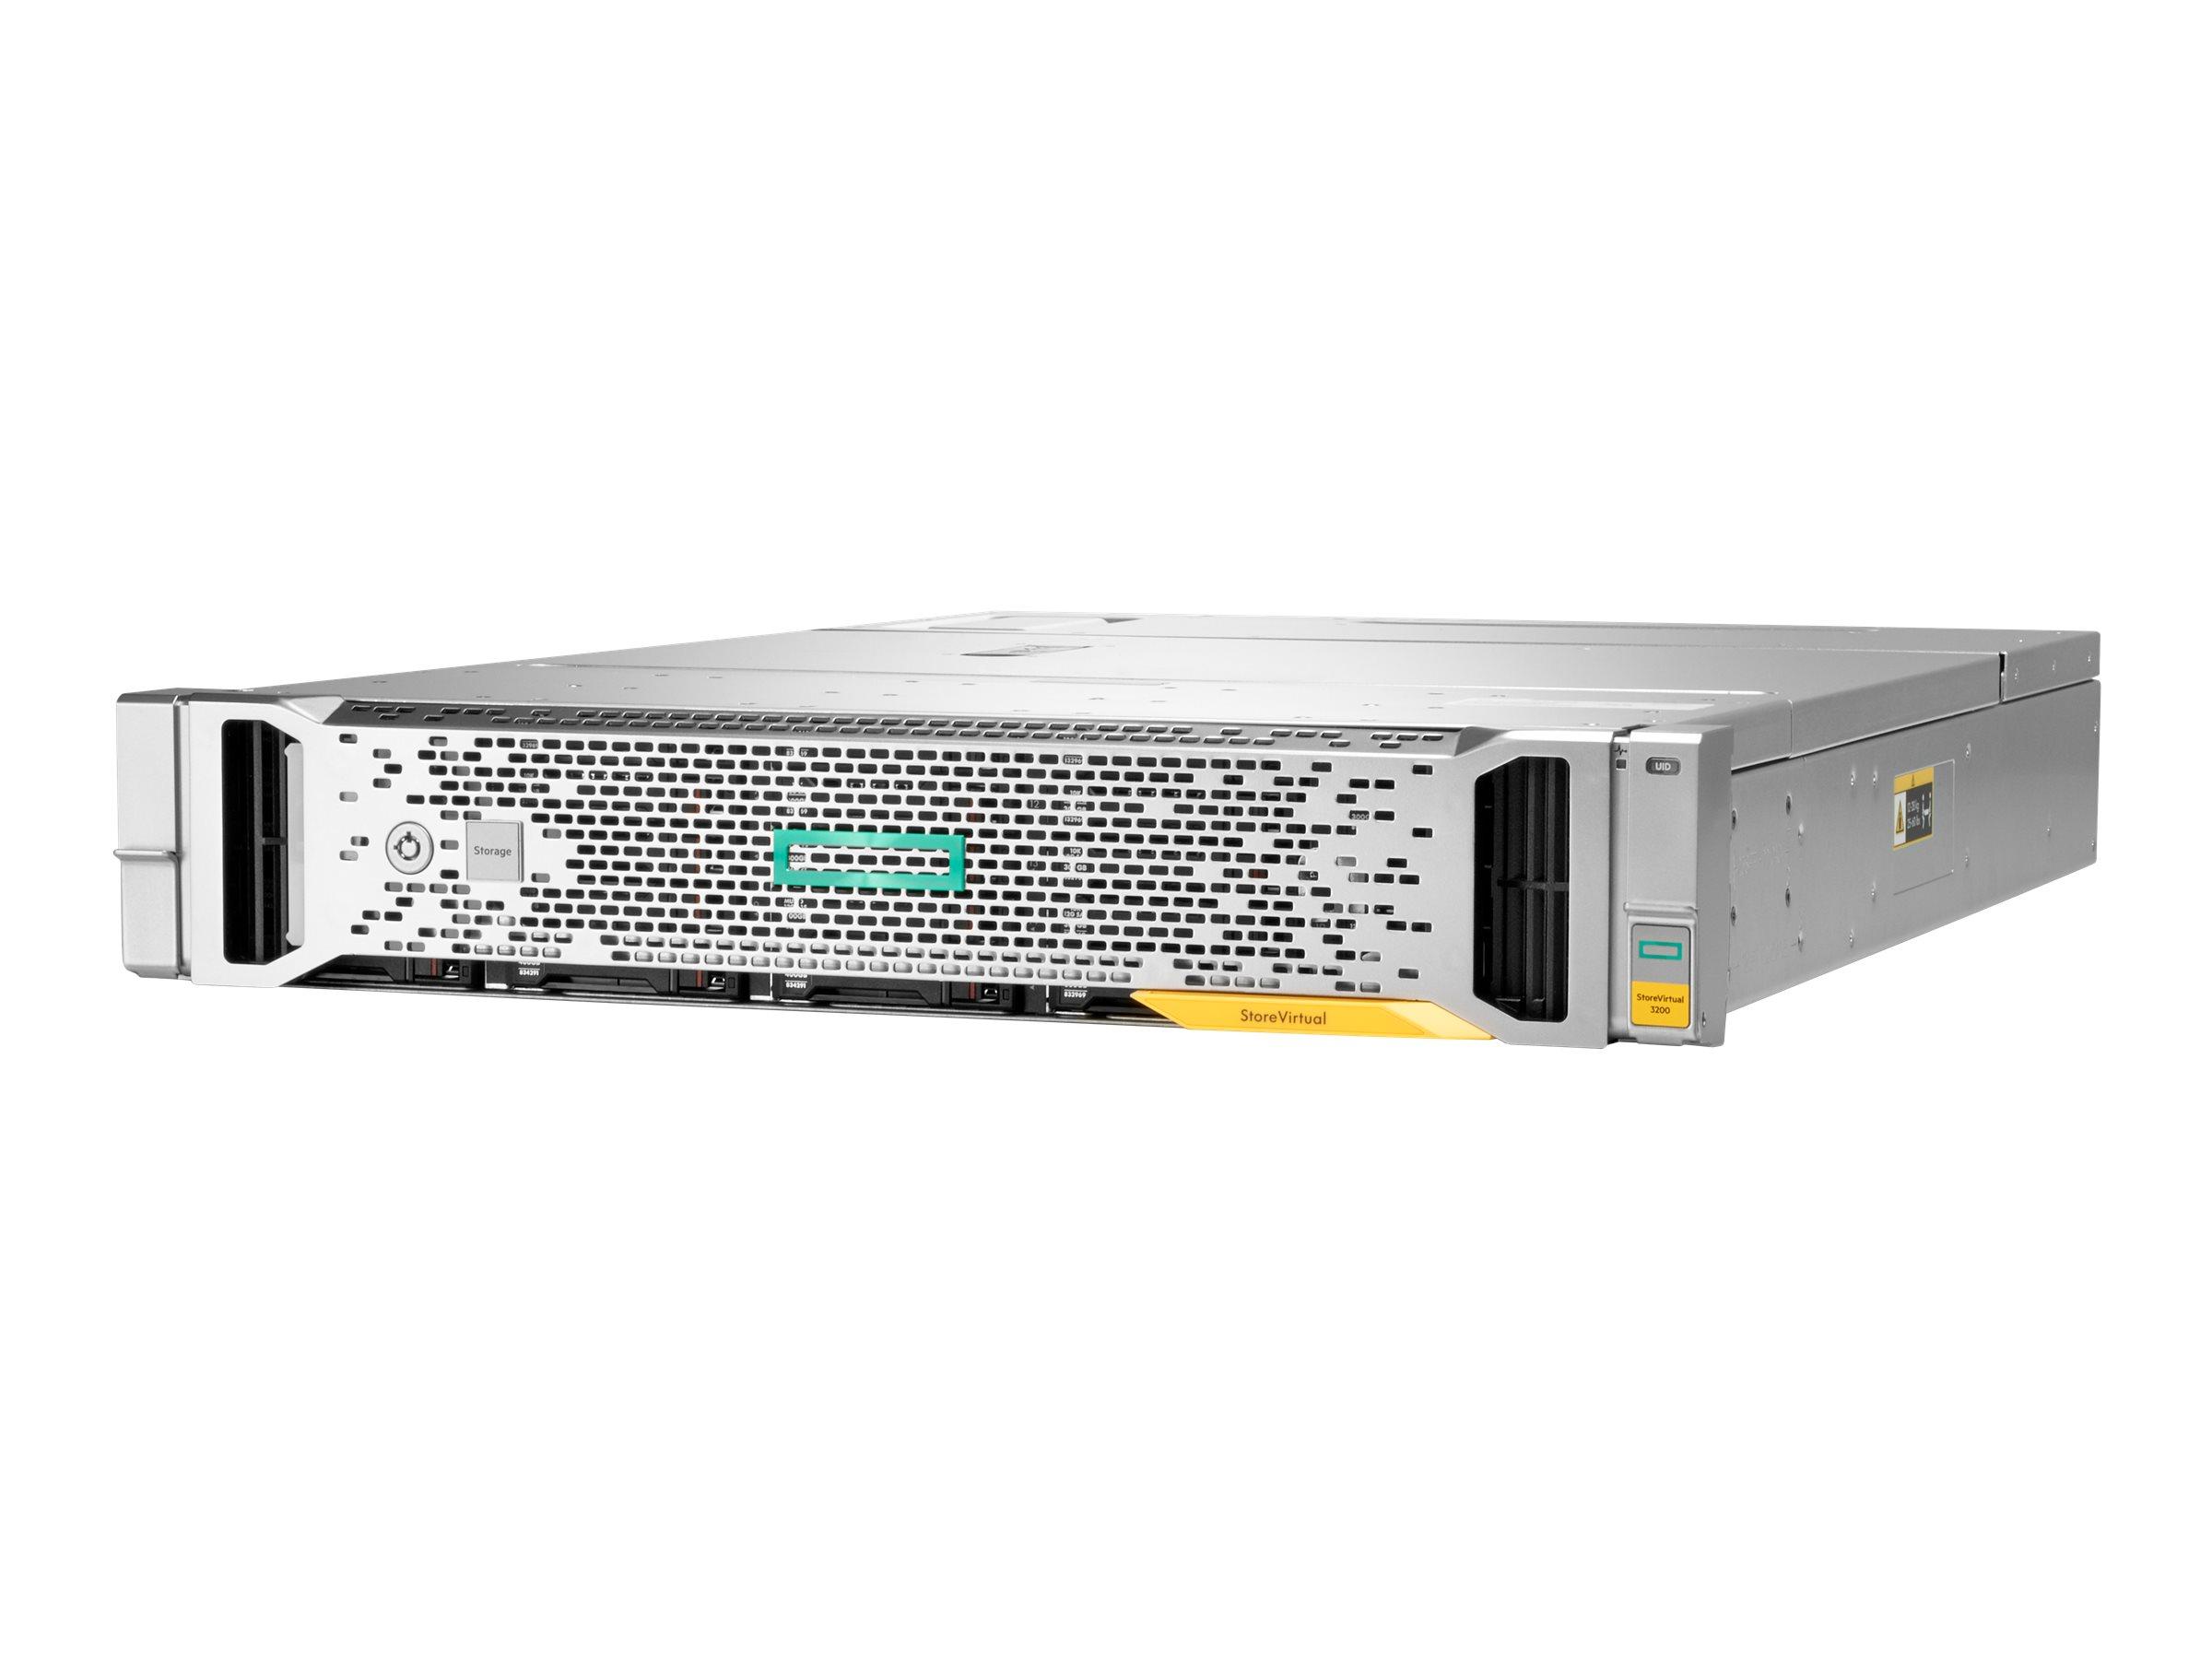 HPE StoreVirtual 3200 SFF - Festplatten-Array - 1.2 TB - 25 Schächte (SAS-3) - iSCSI (10 GbE) (extern) - Rack